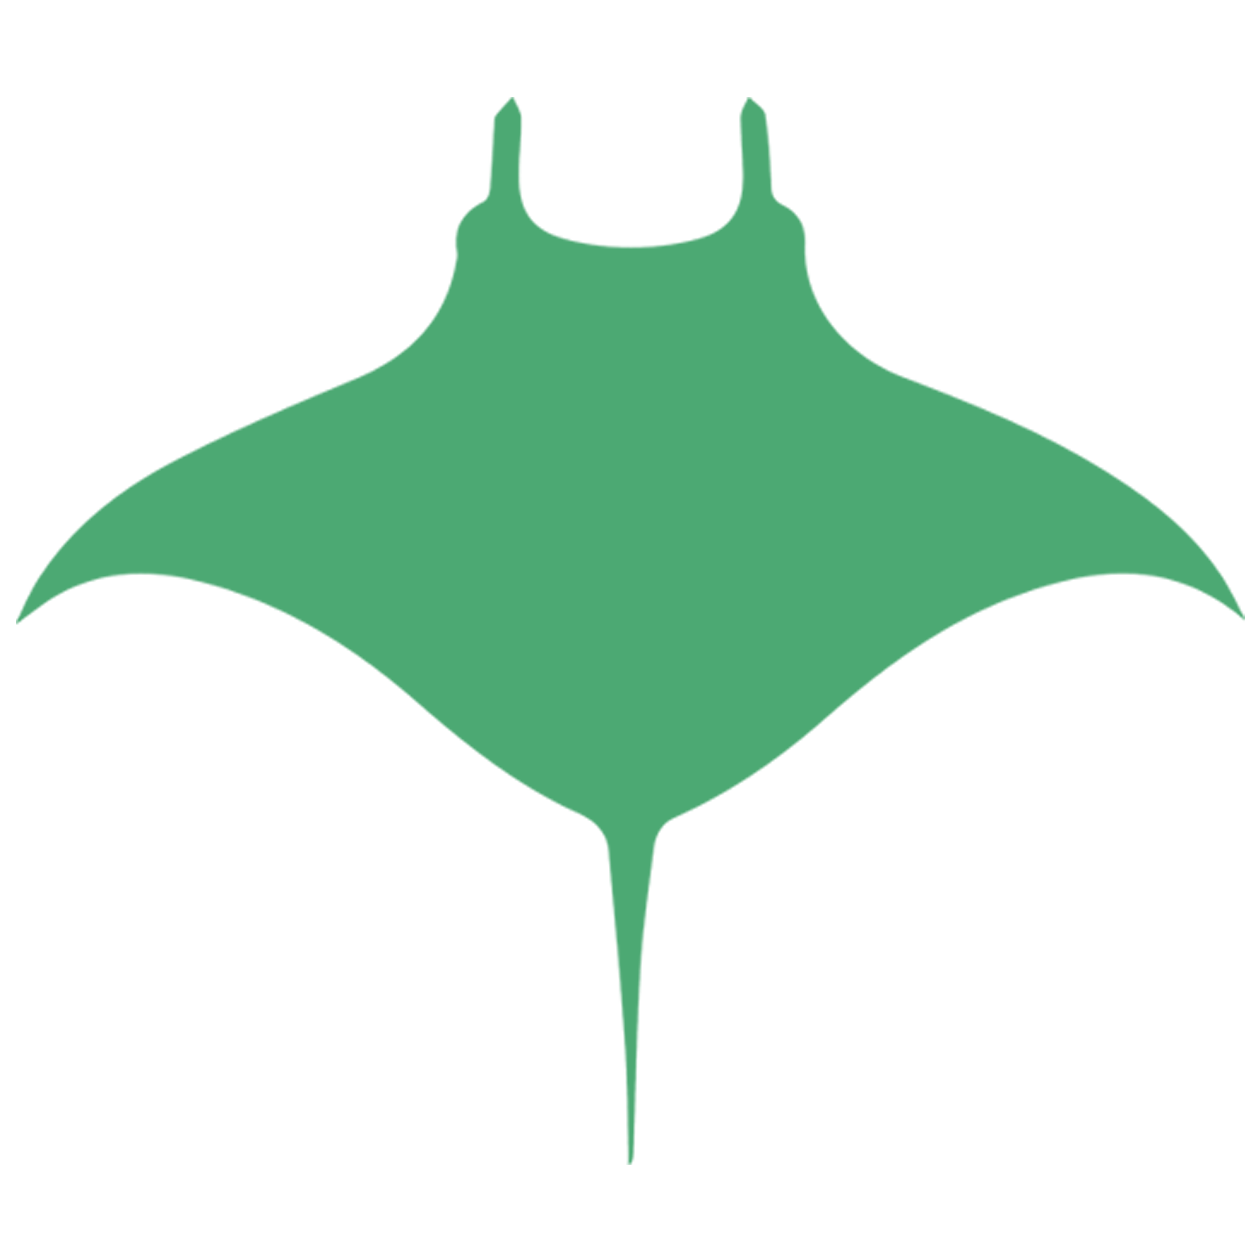 Projeto Verde Mar - ABLM